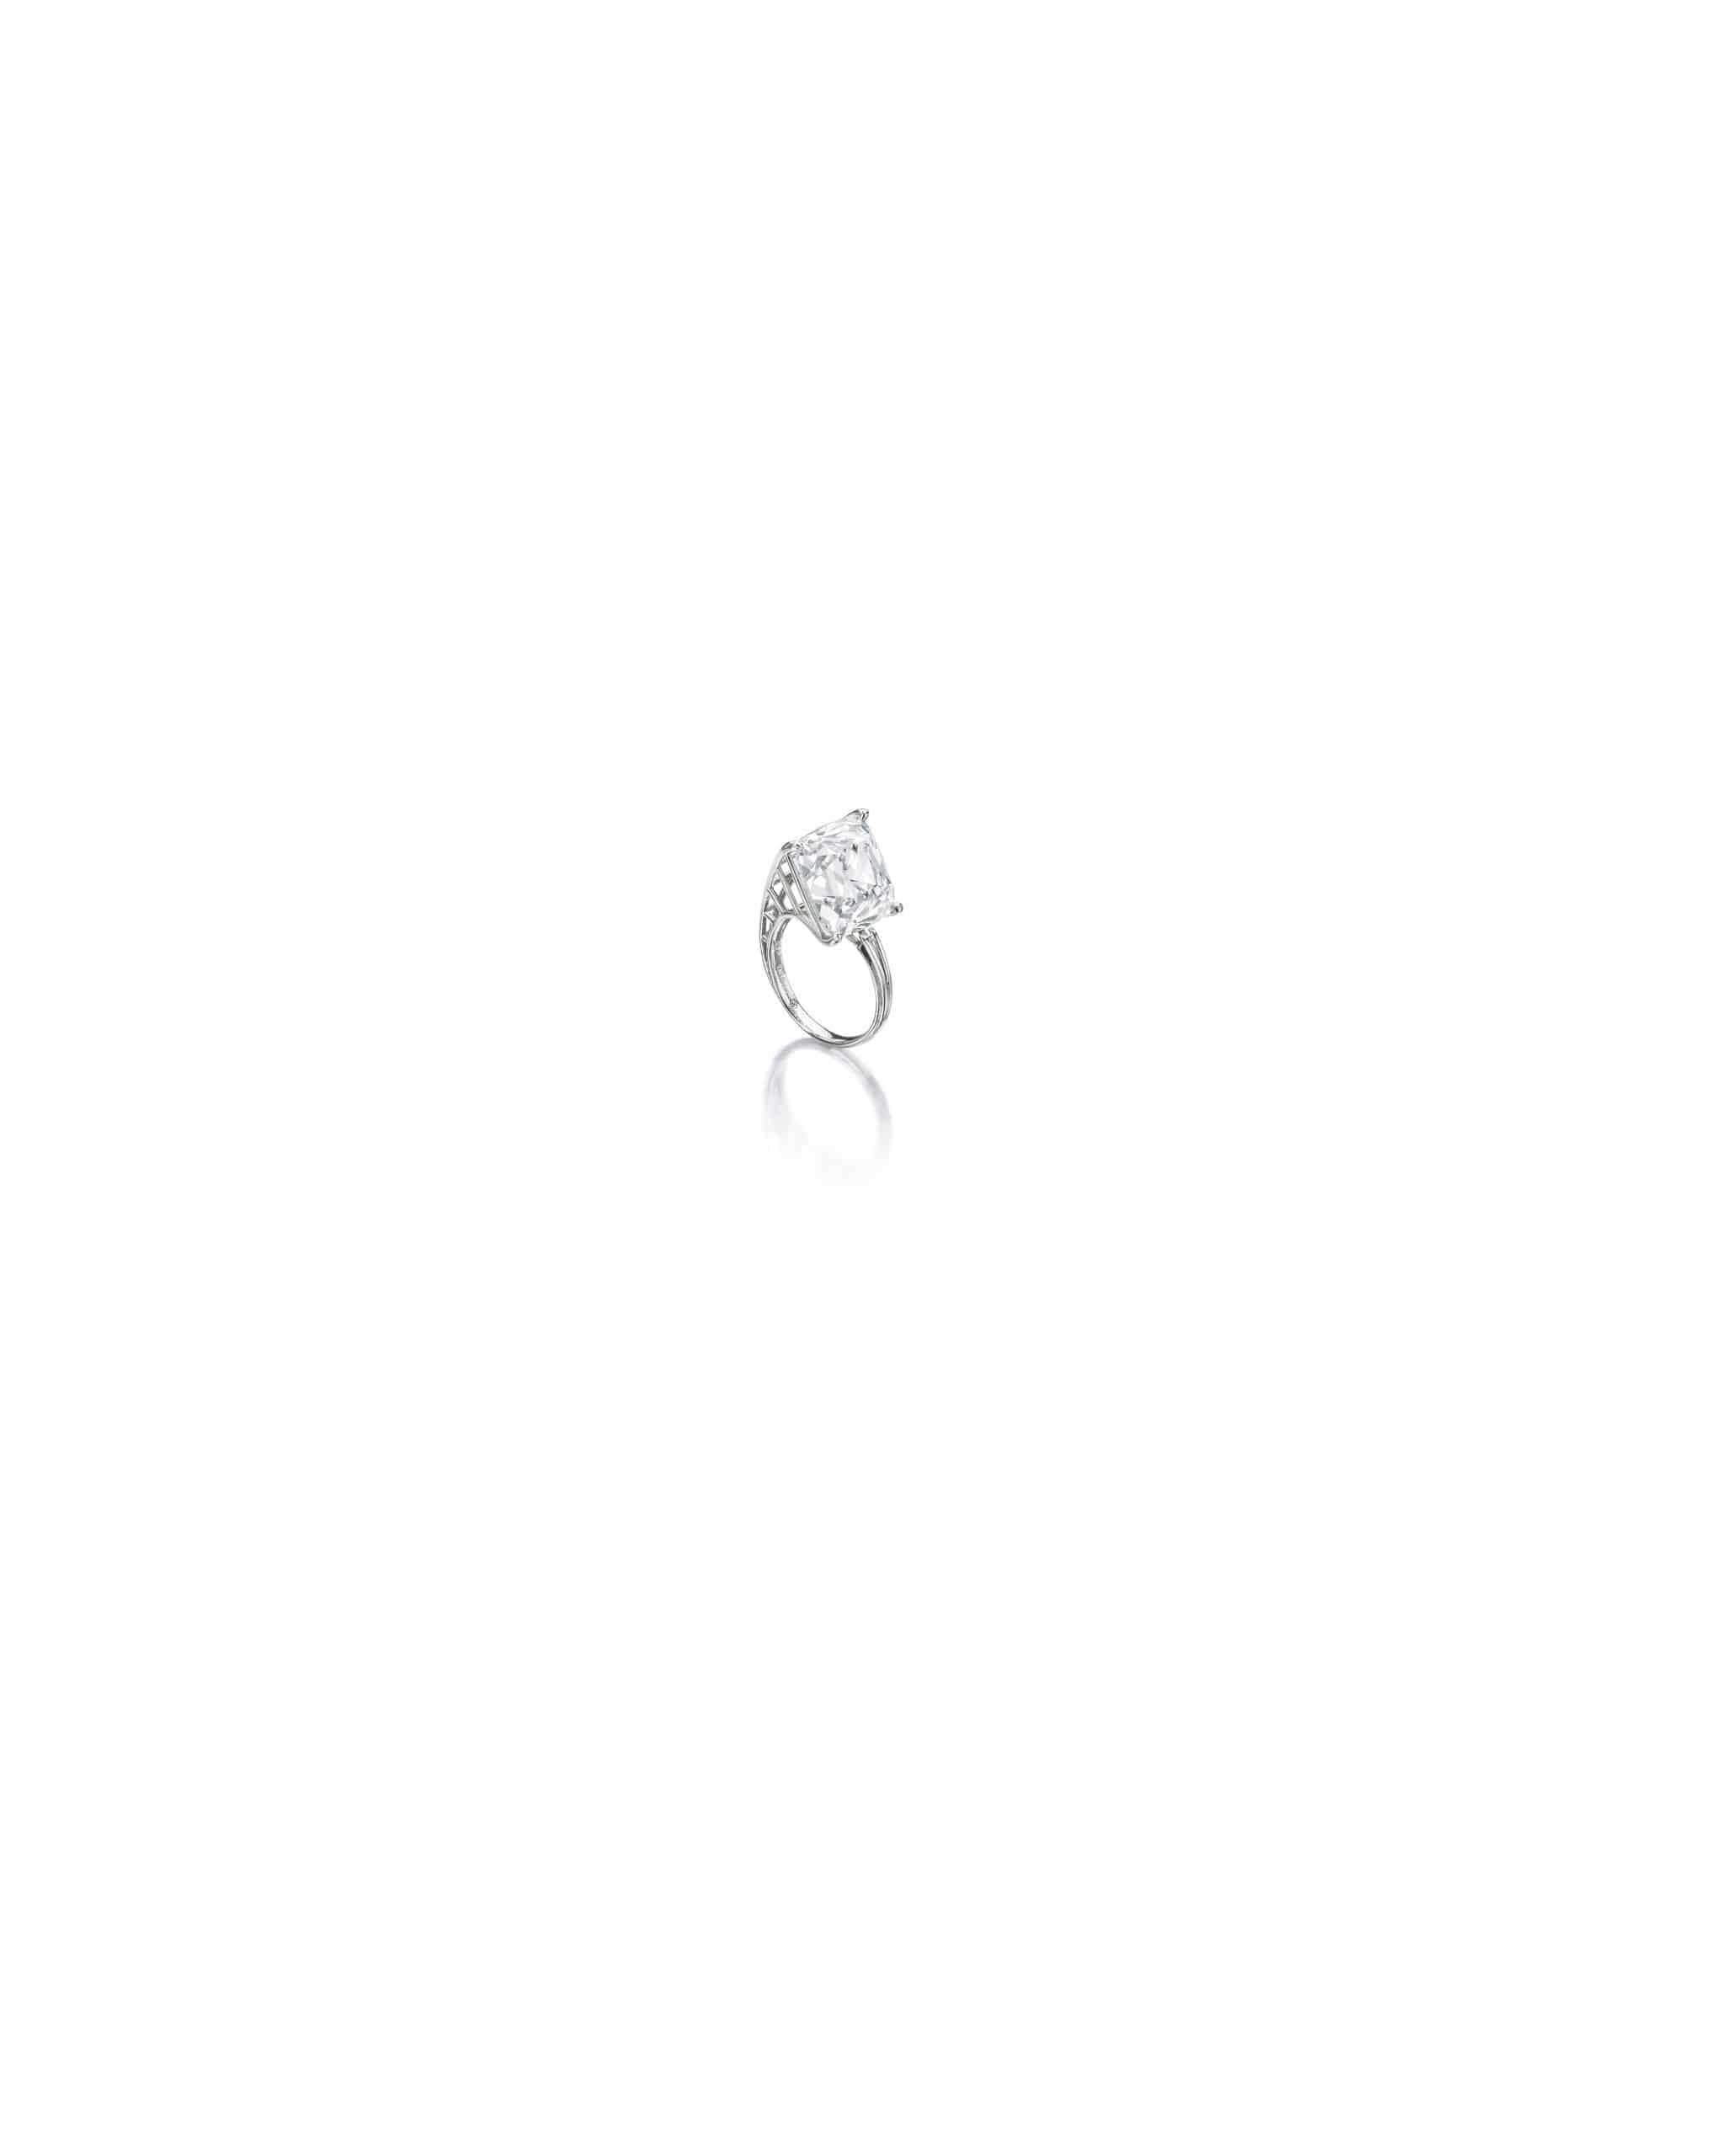 An old-mine cut diamond ring